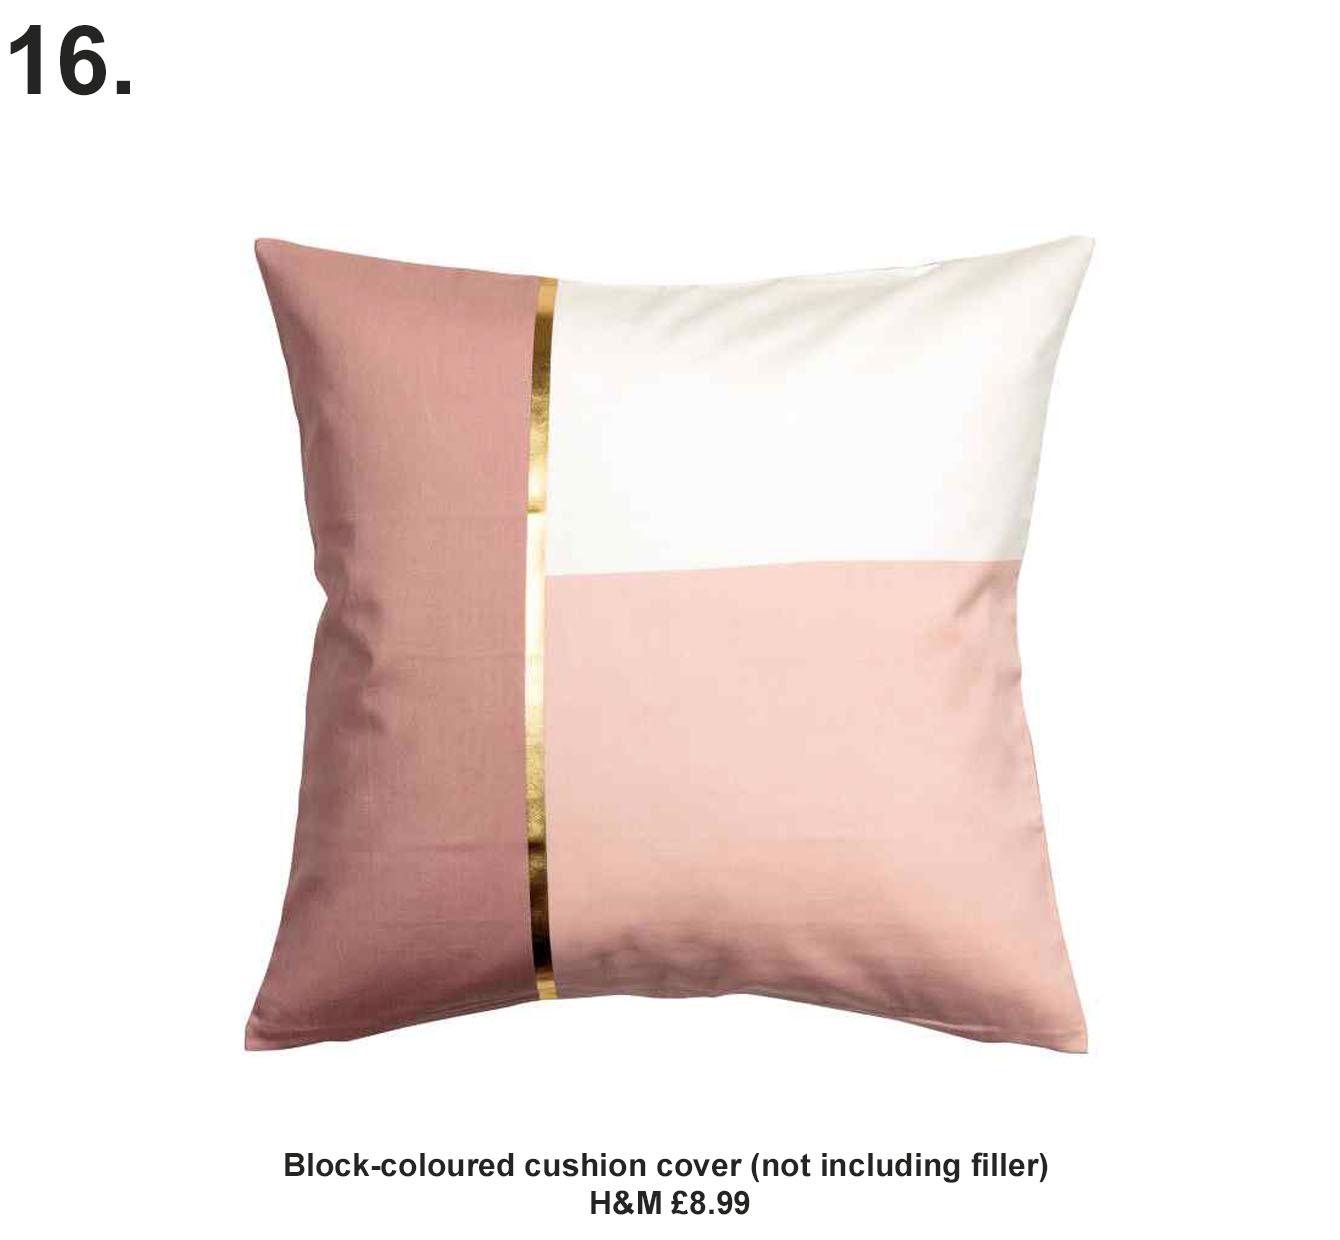 Block-coloured cushion cover. H&M £8.99